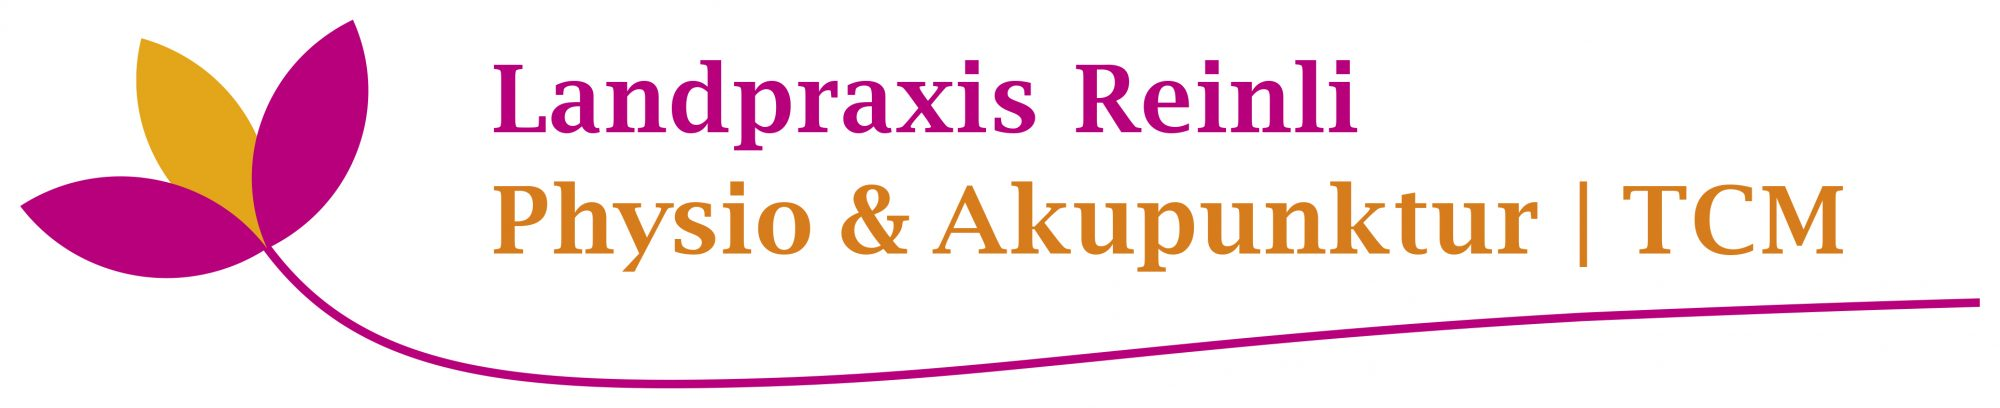 Physiotherapie, Craniosacraltherapie, Akupunktur, TCM